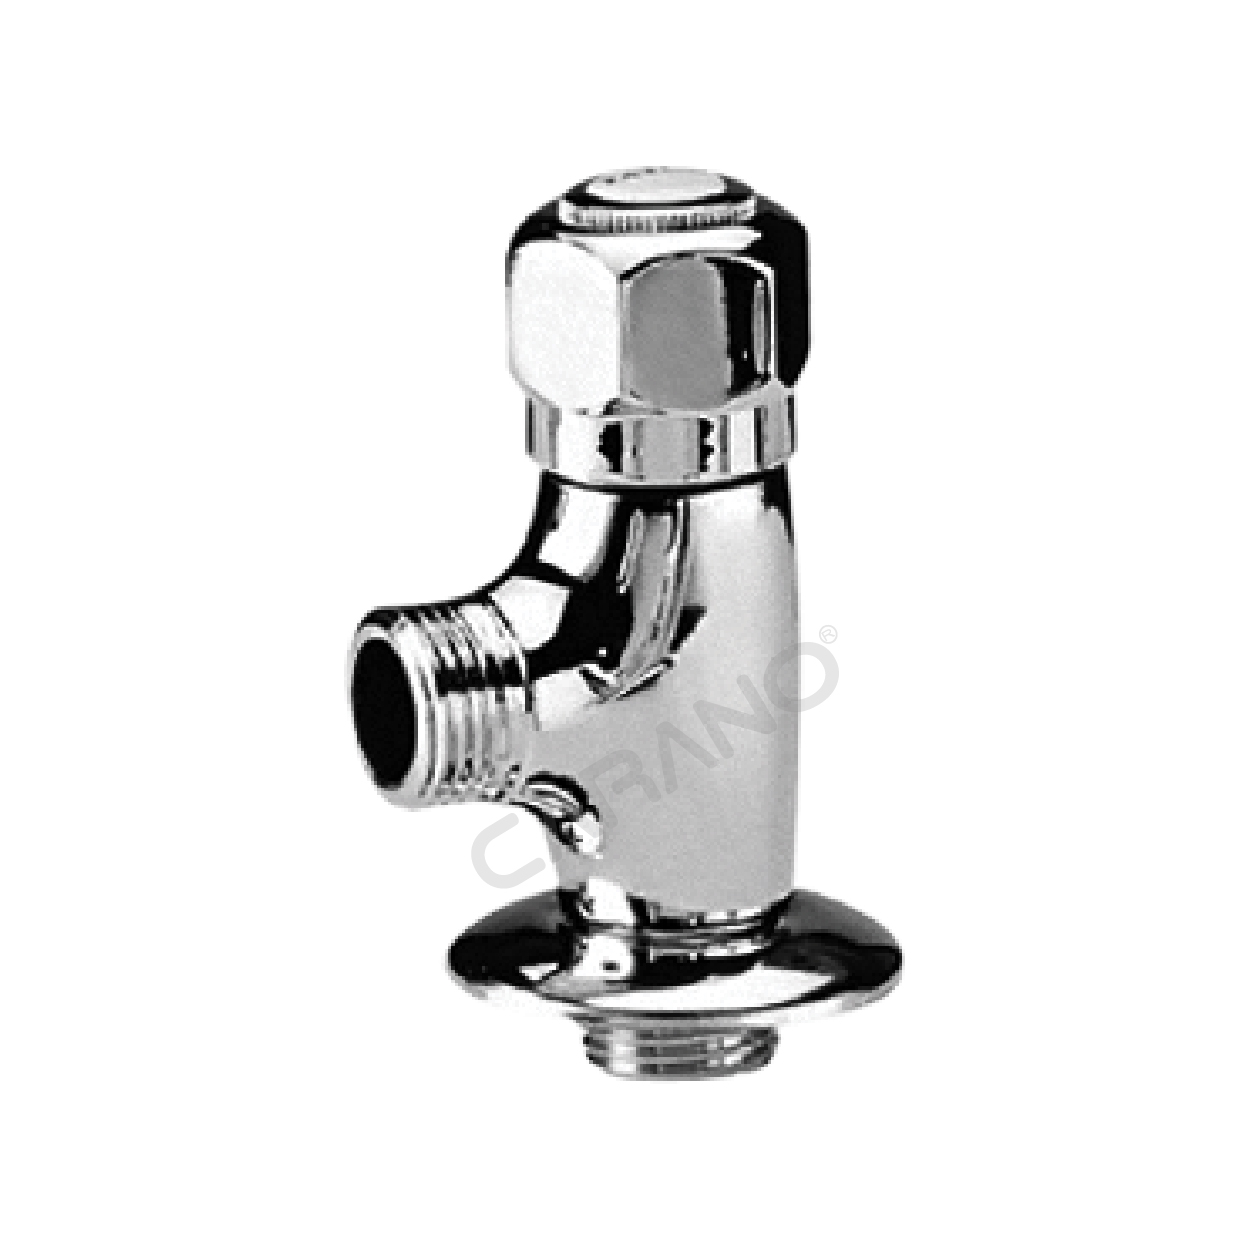 VAN KHÓA NƯỚC CARANO A8600 (van khóa nước model:A8600)